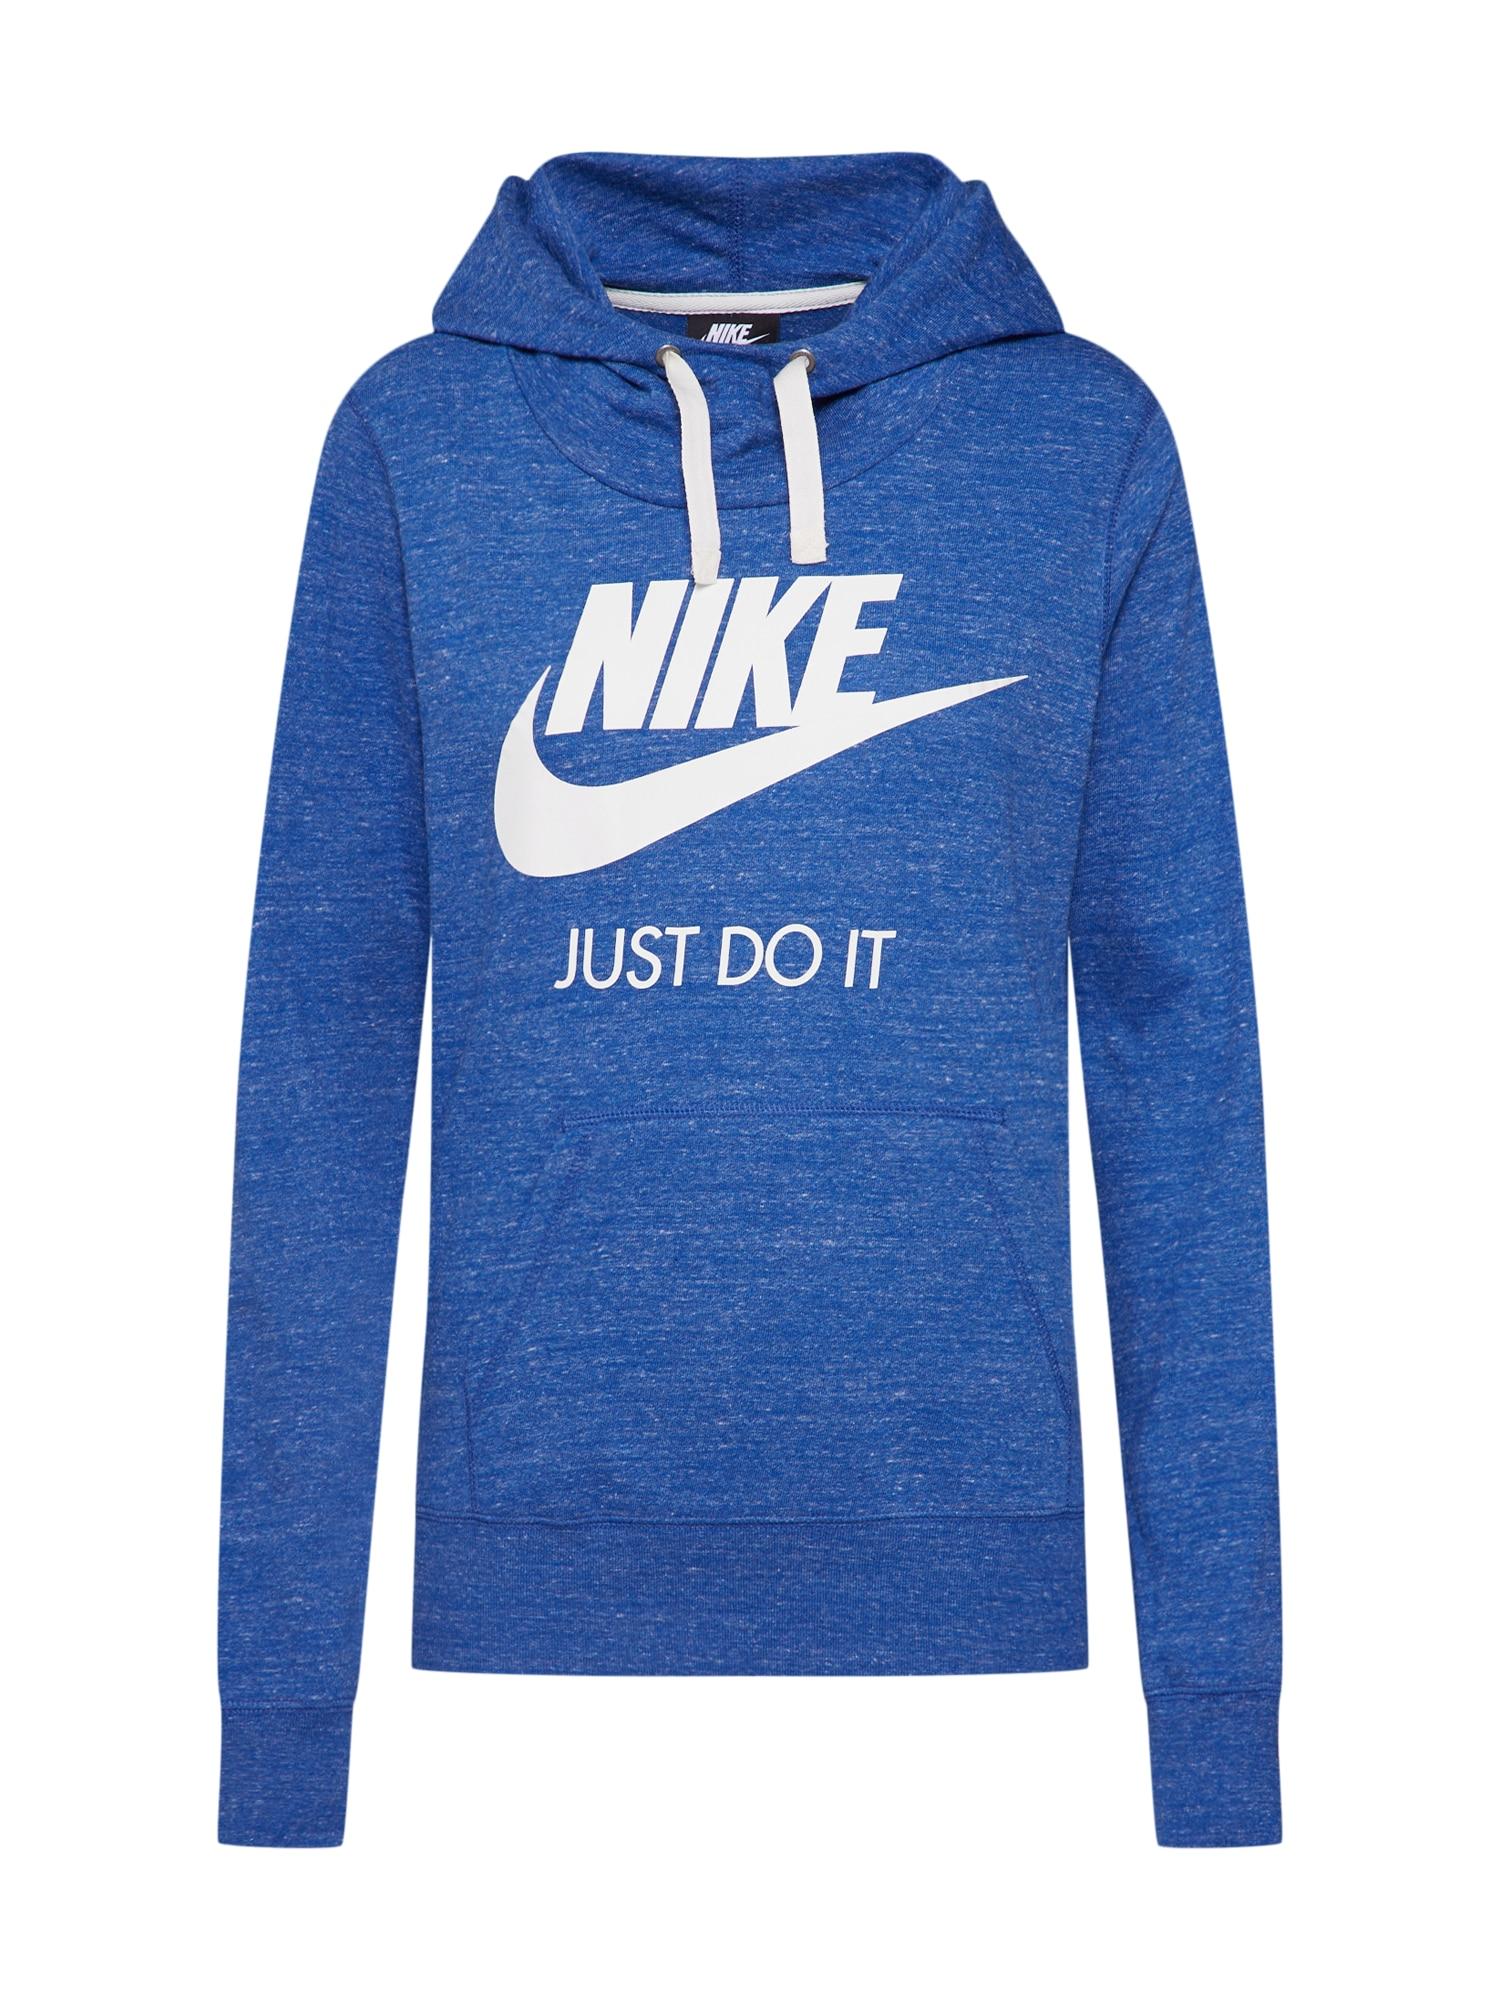 Nike Sportswear, Dames Sweatshirt 'GYM HOODIE', blauw